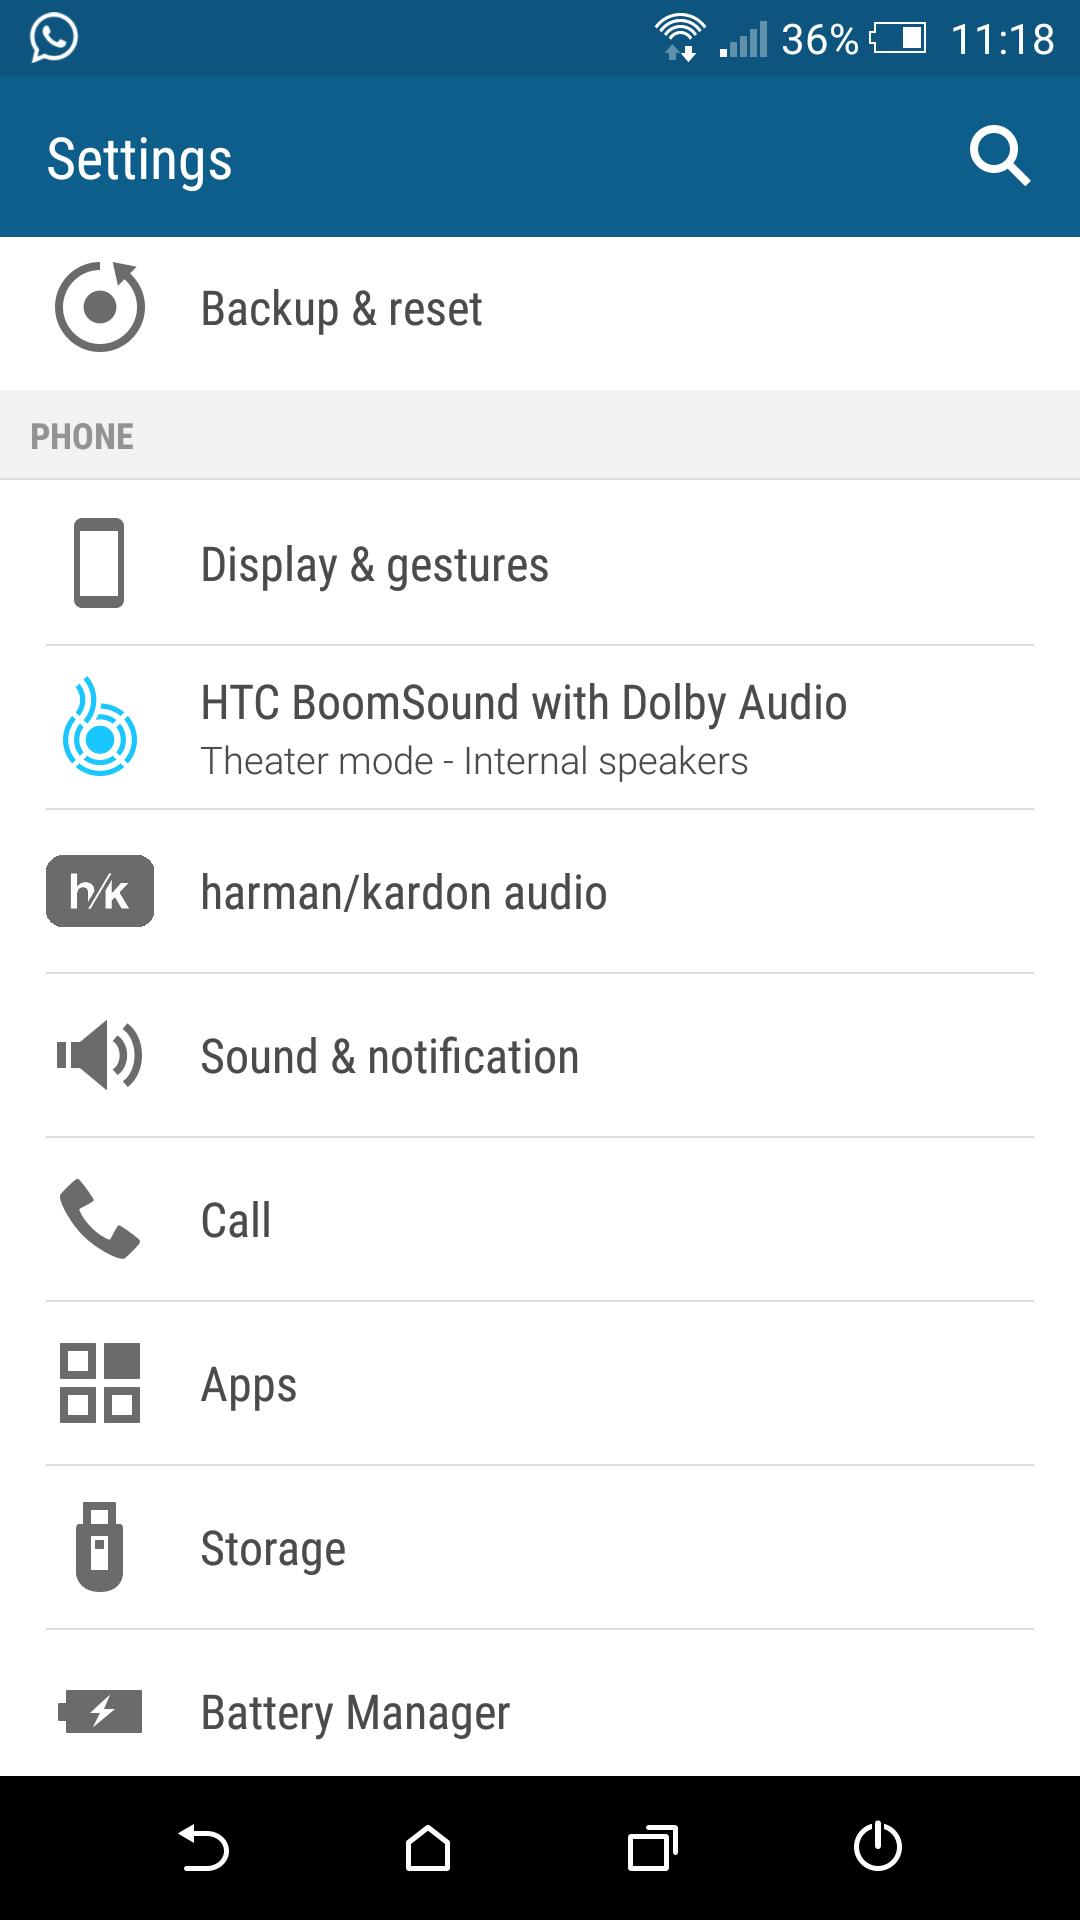 [ROM HTC ONE M9] LOLLIPOP SENSE7 | SkyDragon  V2.0.1 | Dev Edition  [06/04/2015] Attachment